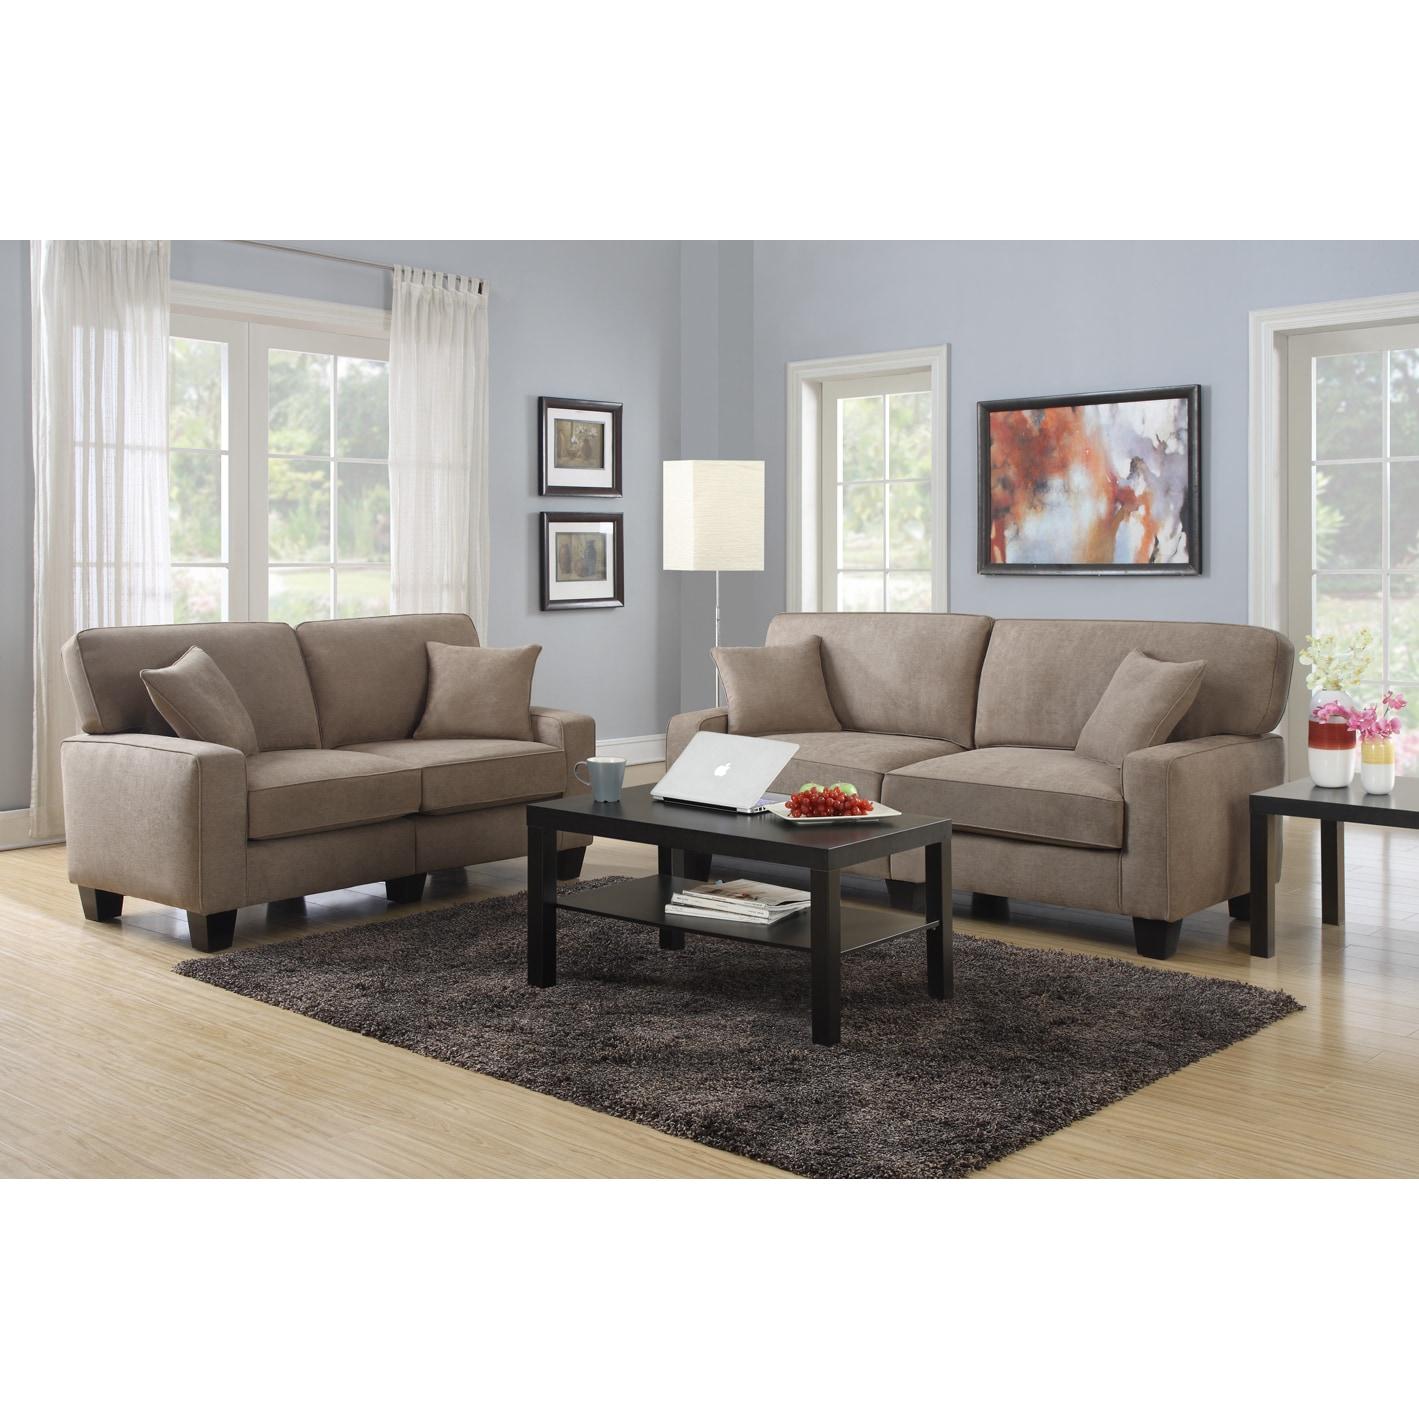 Shop Serta RTA Palisades Collection 73 inch Fawn Tan Sofa Free